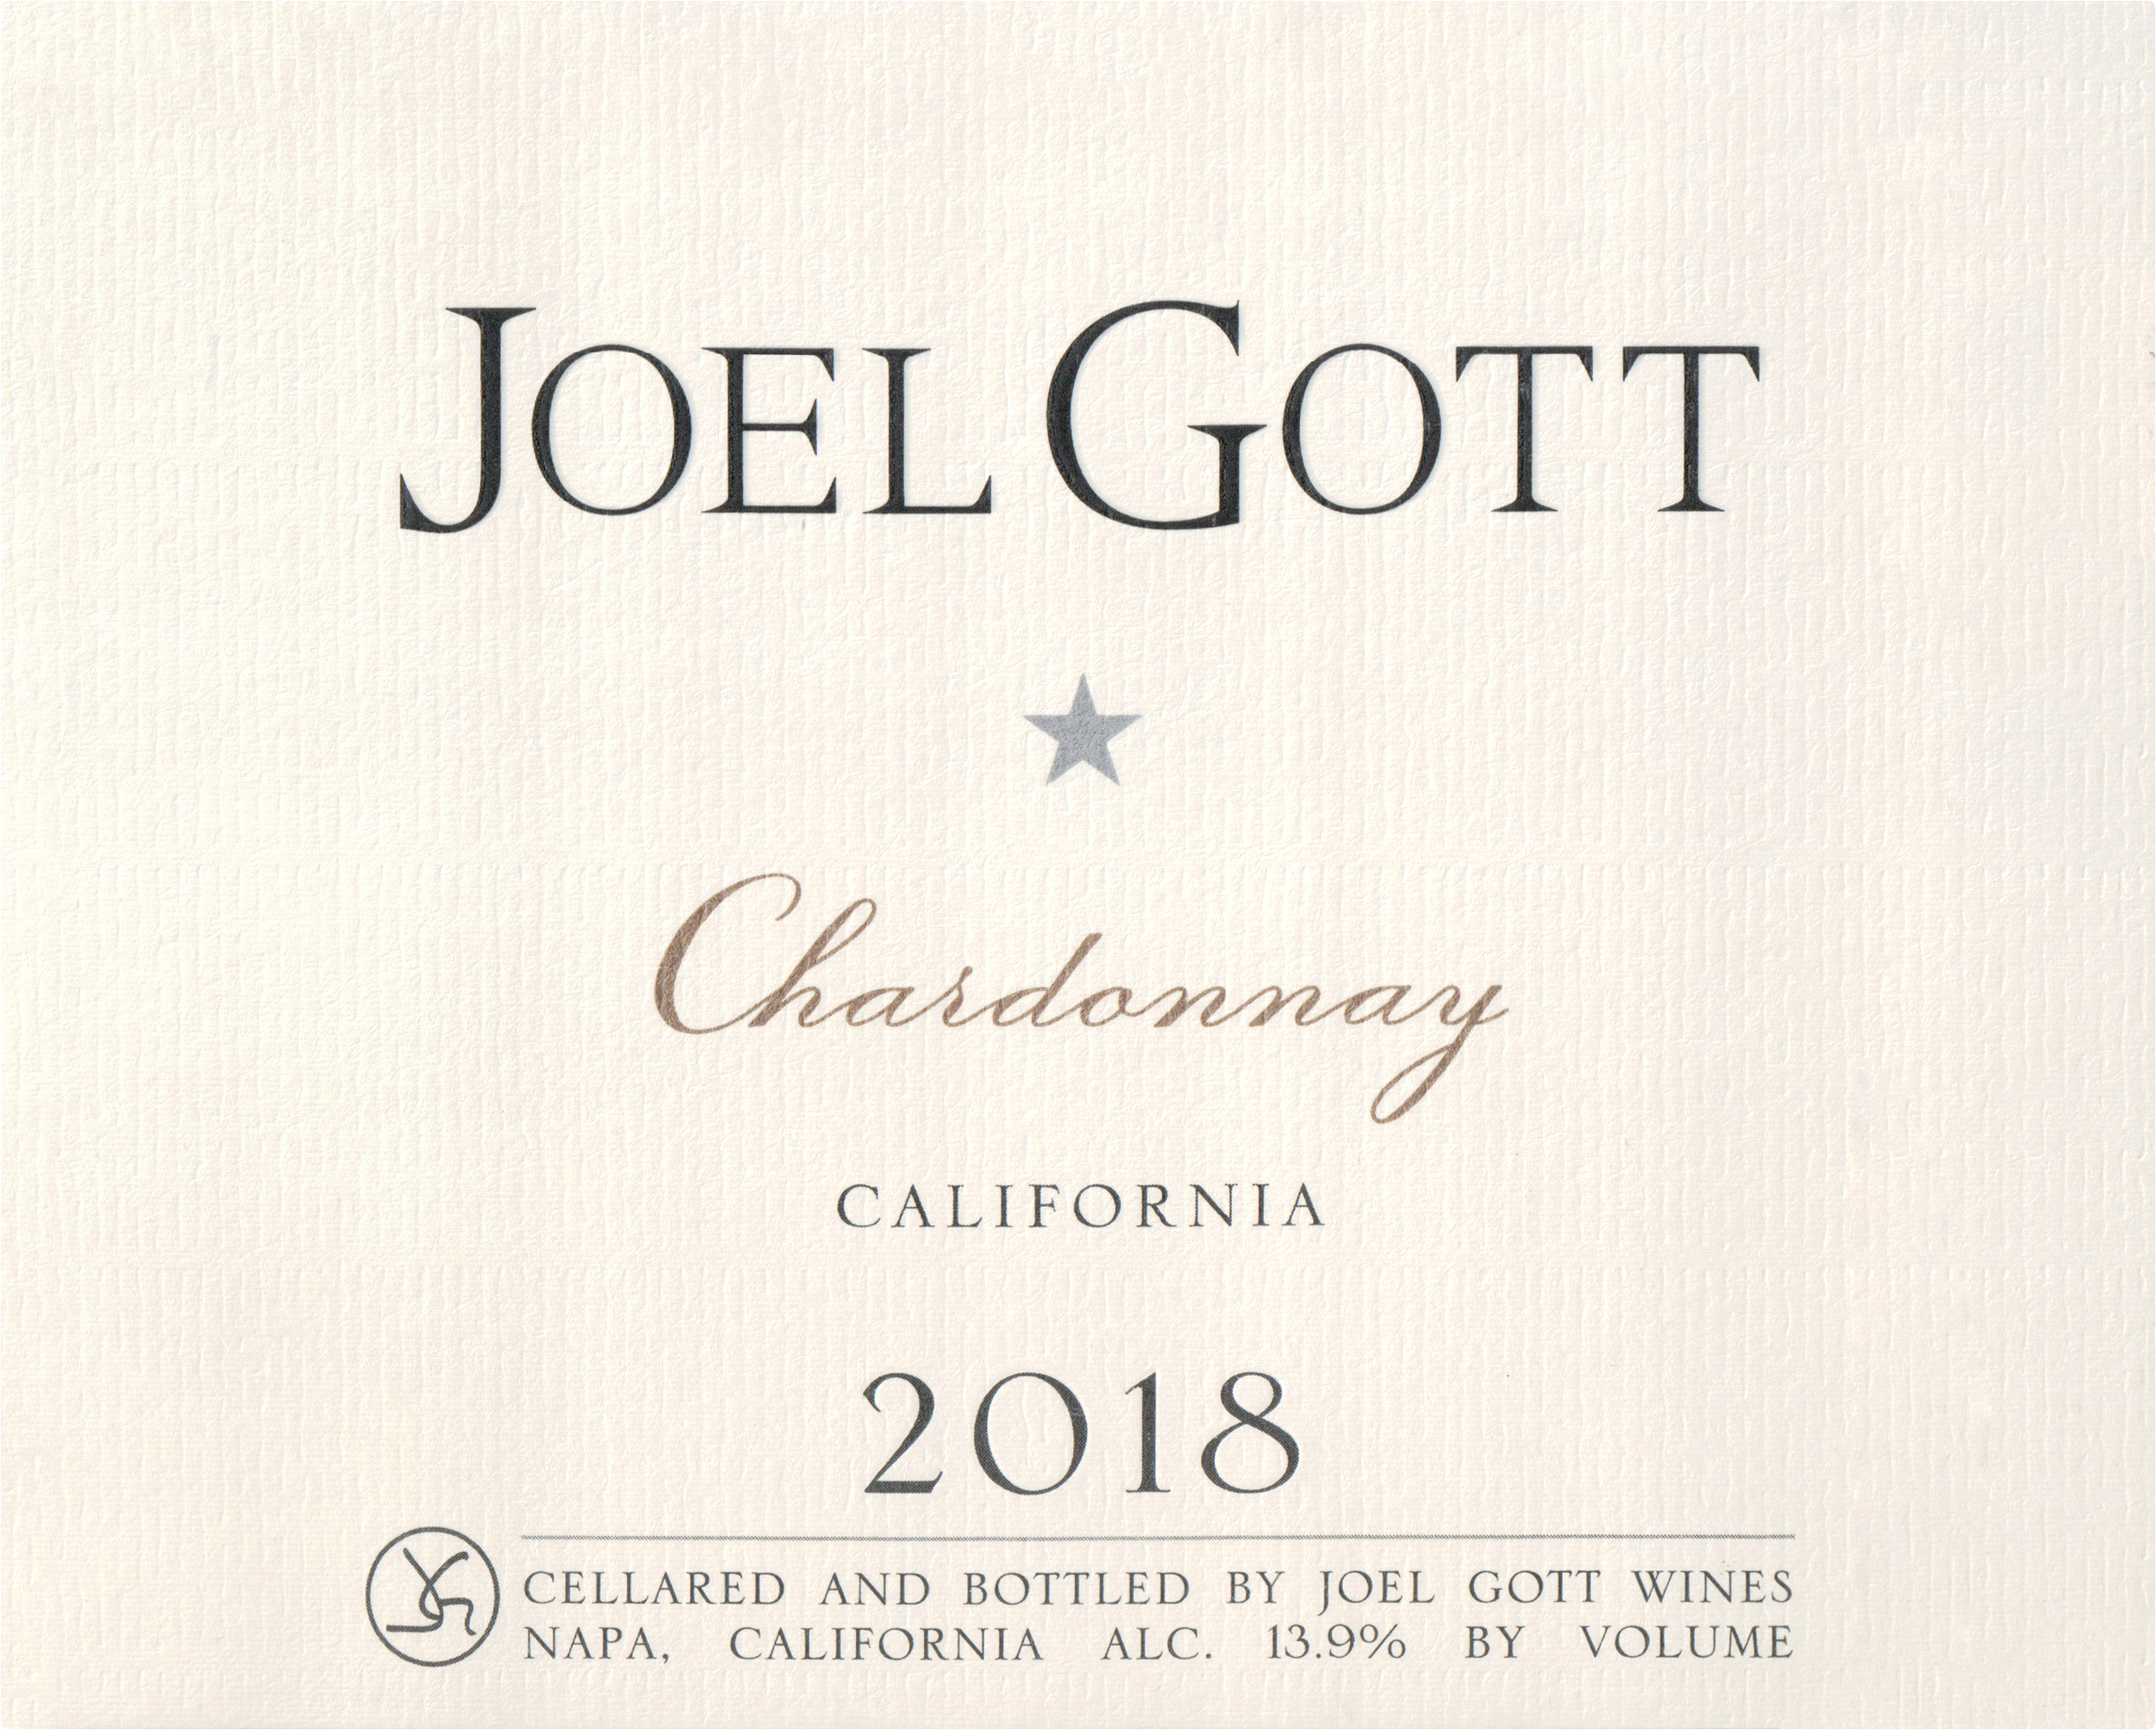 Joel Gott Chardonnay Monterey 2018